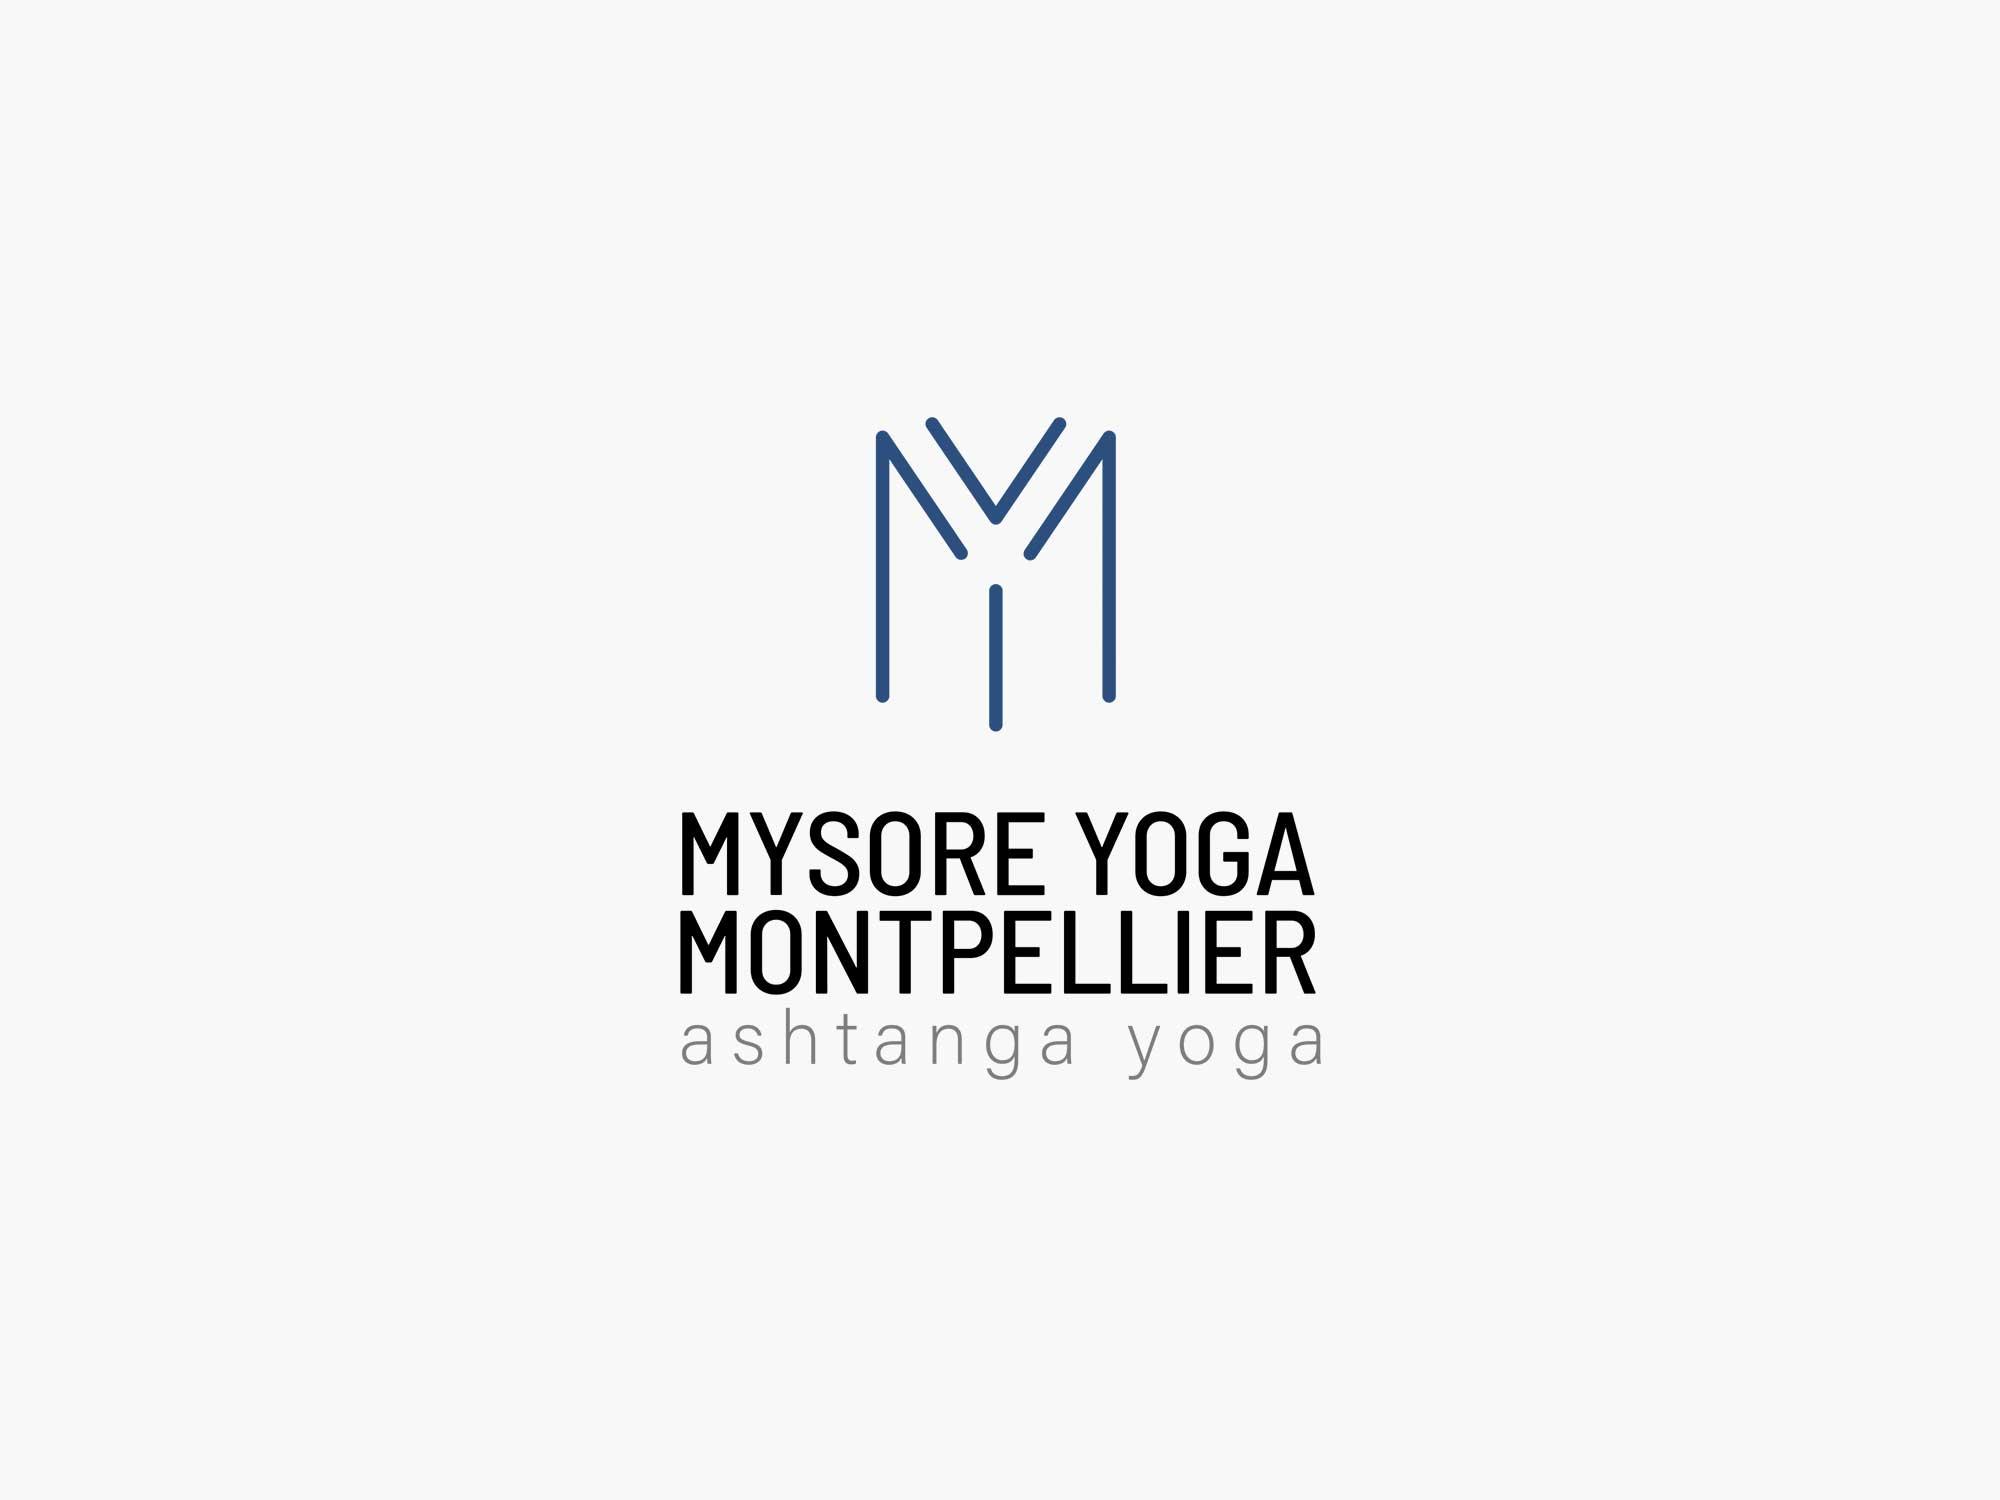 Mysore Yoga Montpellier